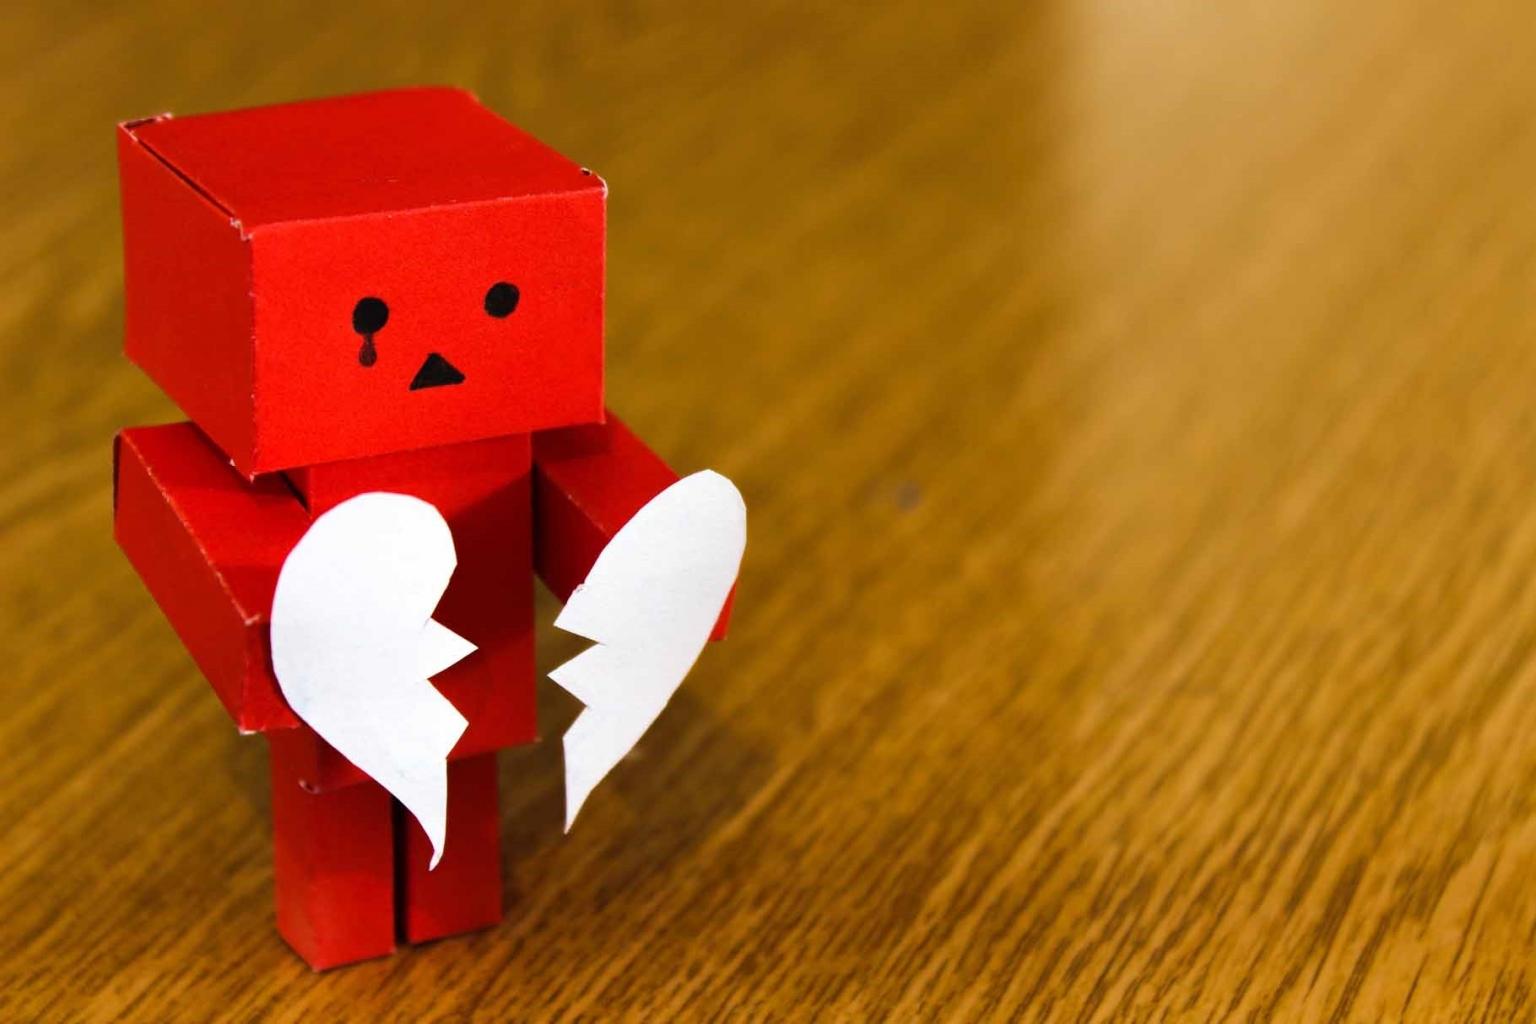 How to Escape an Unhappy Marriage